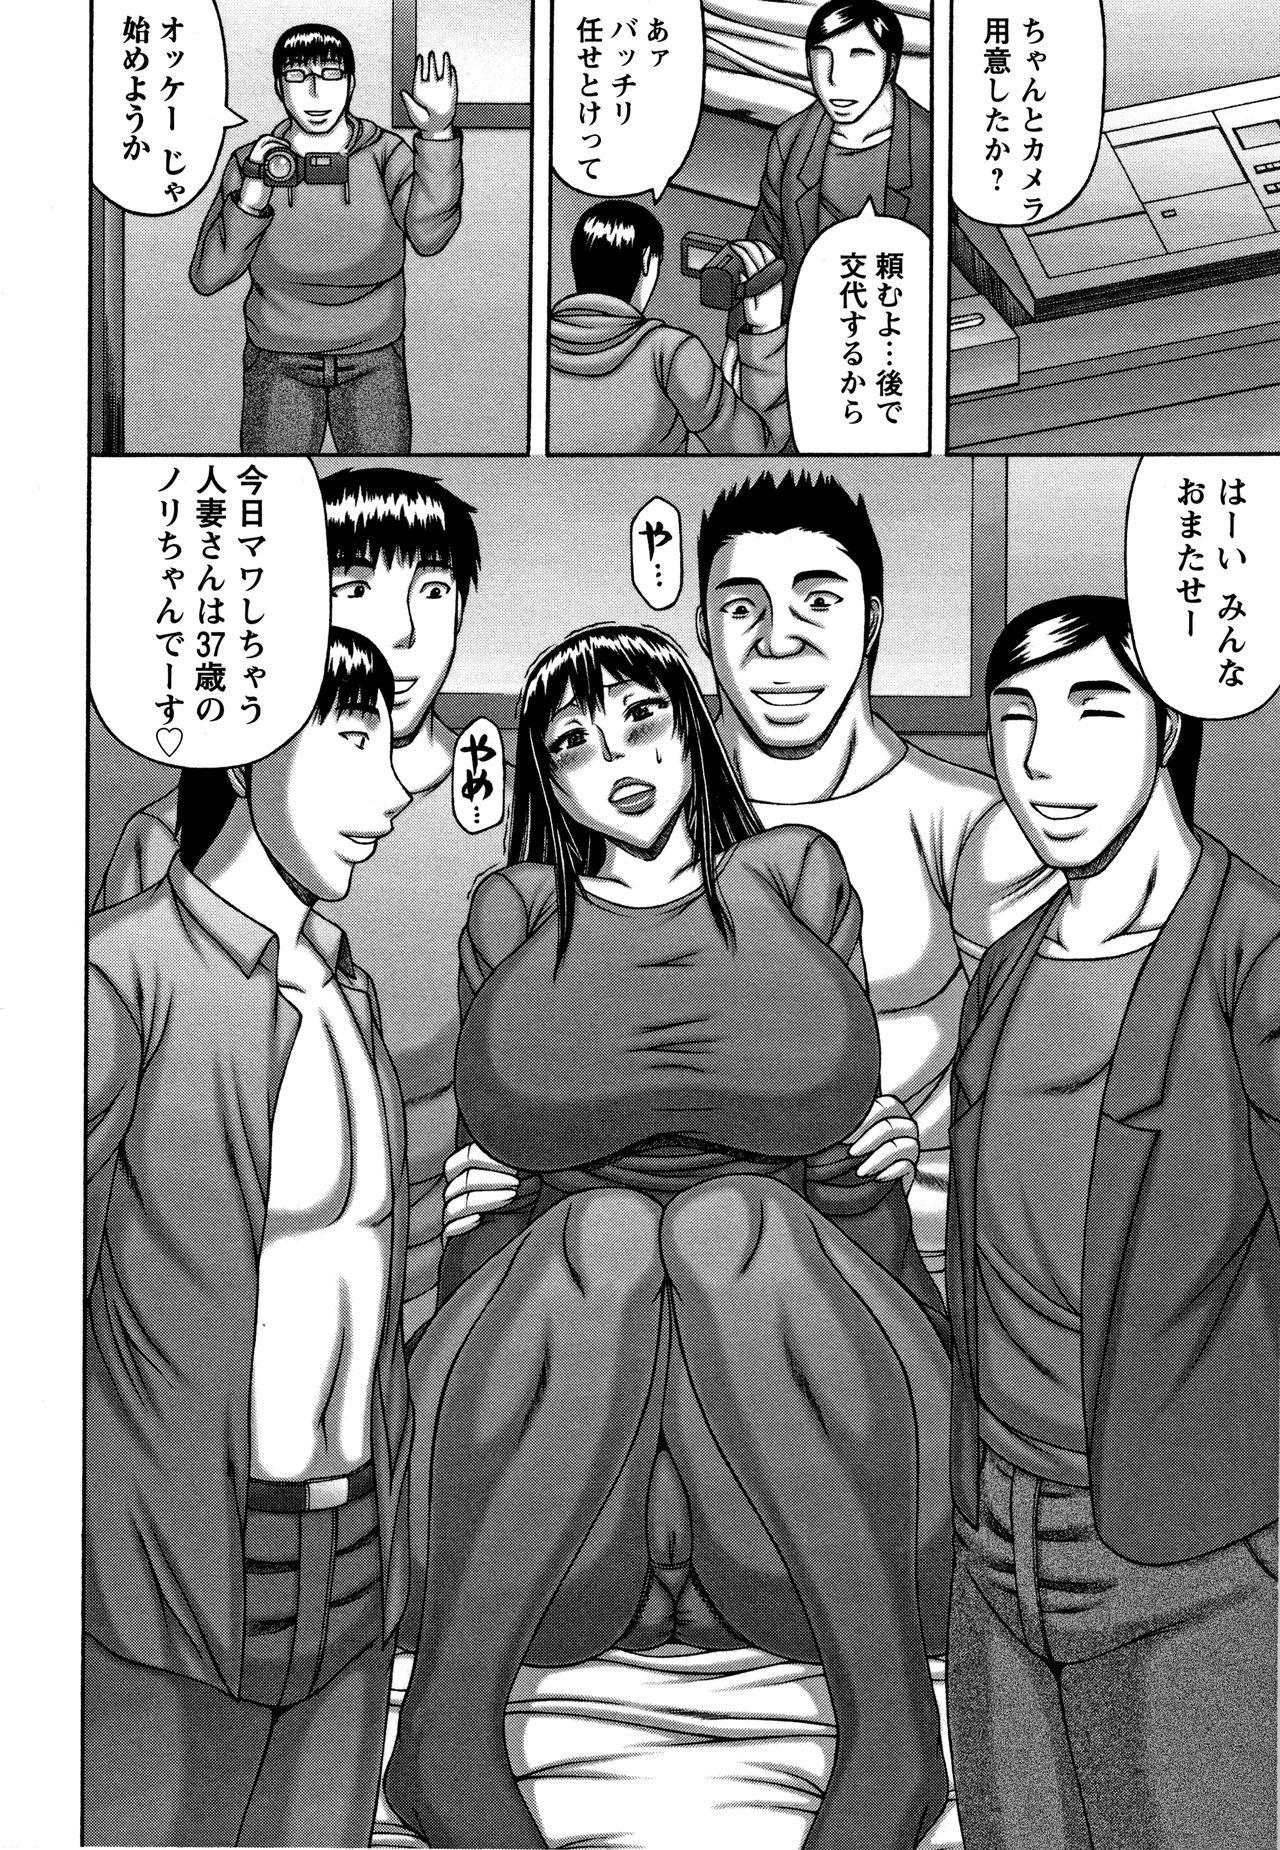 Tsuma no Netorare Kinenbi - My Wife NTR Memorial Day 48